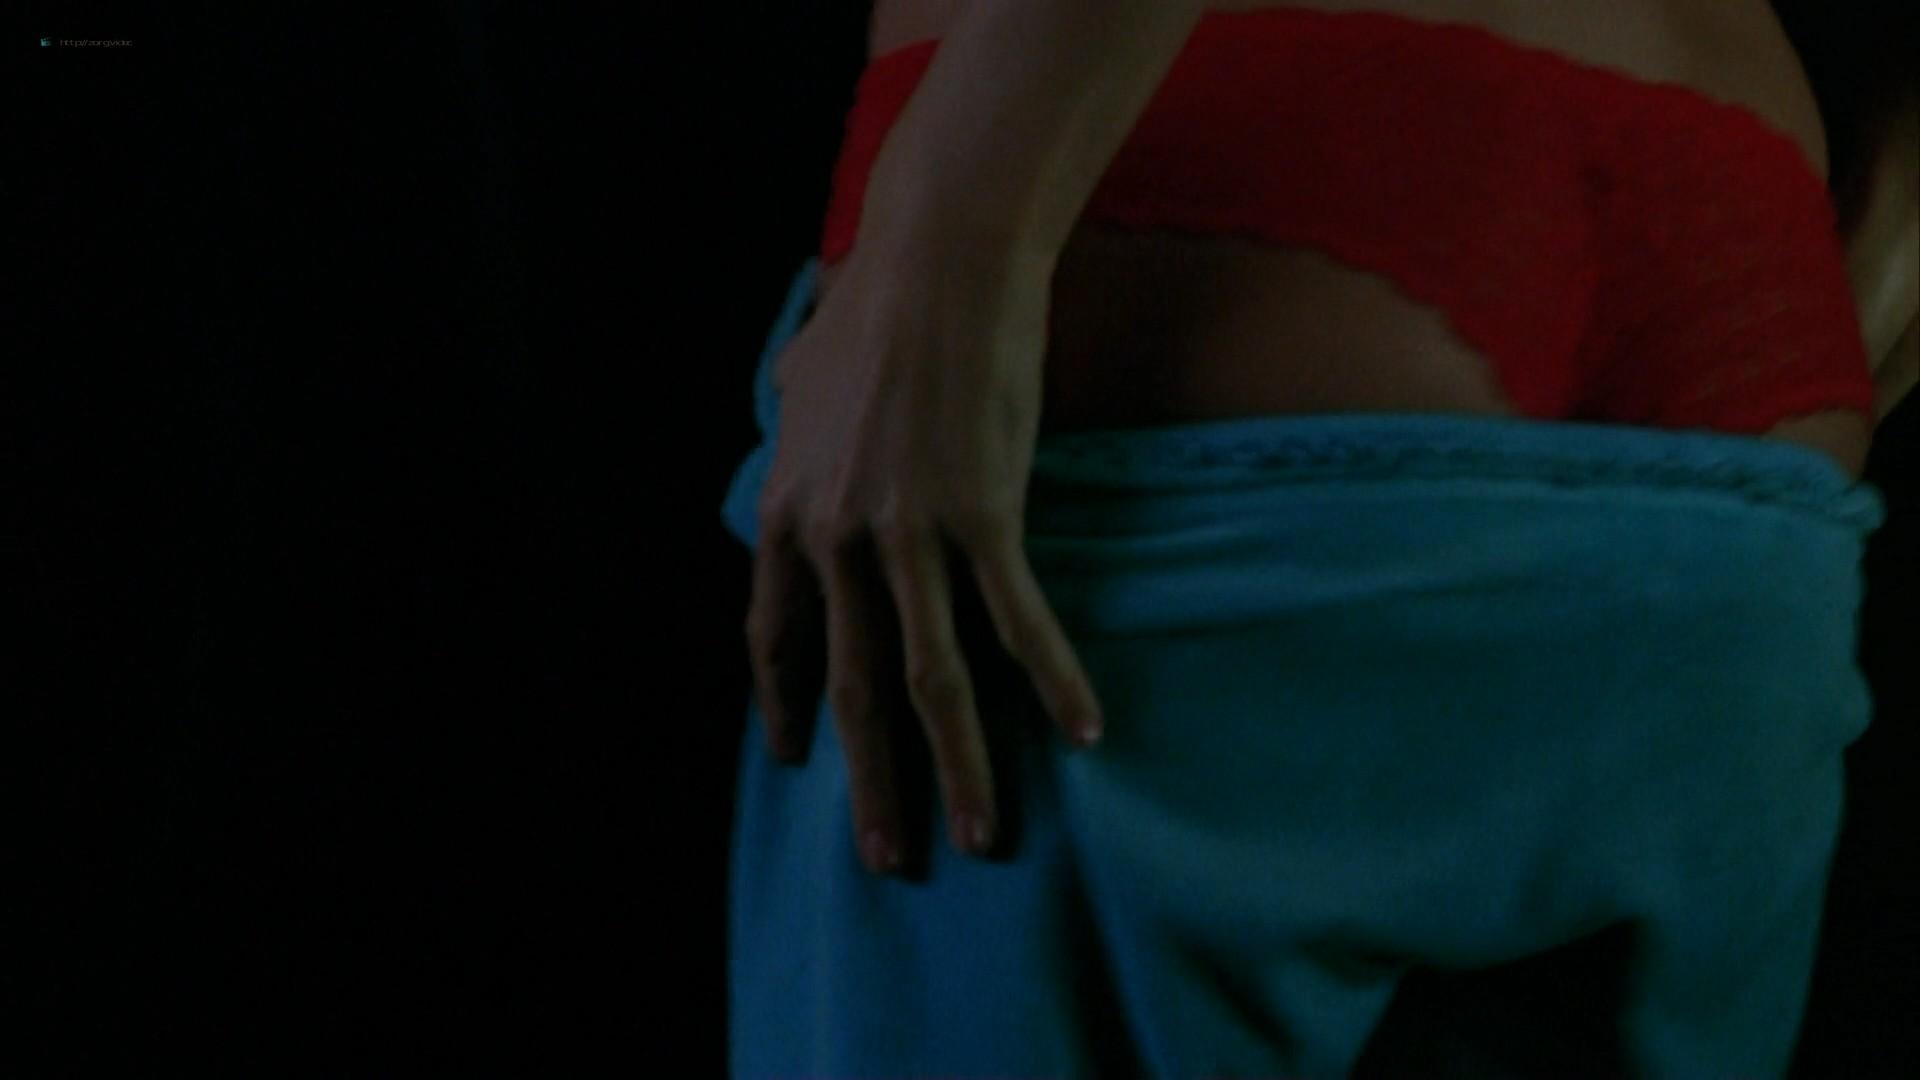 Elisha Cuthbert hot cleavage Paris Hilton striping to bra and panties - House of Wax (2005) HD 1080p (8)